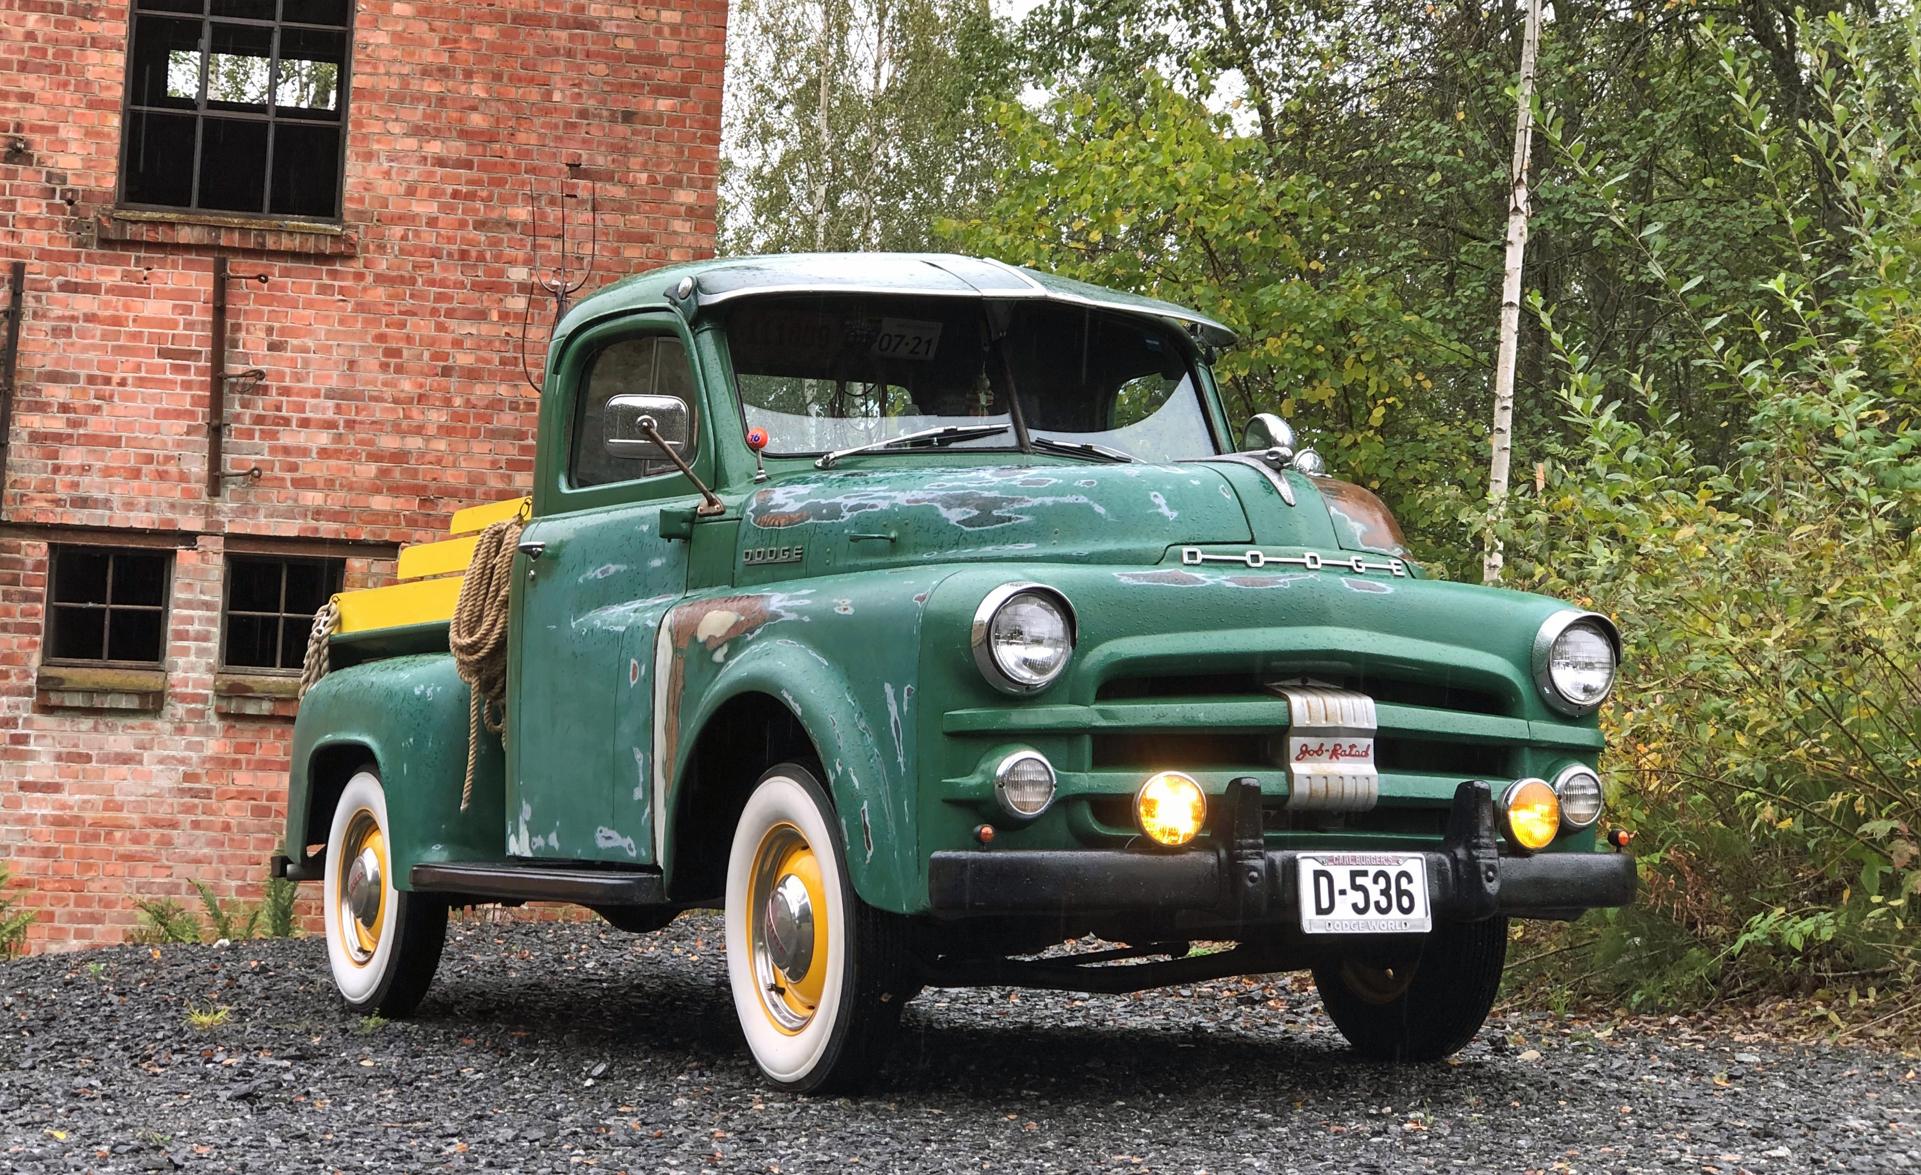 351-1953 Dodge B4B 0,5 t pickup 02. Eier- medlem 3